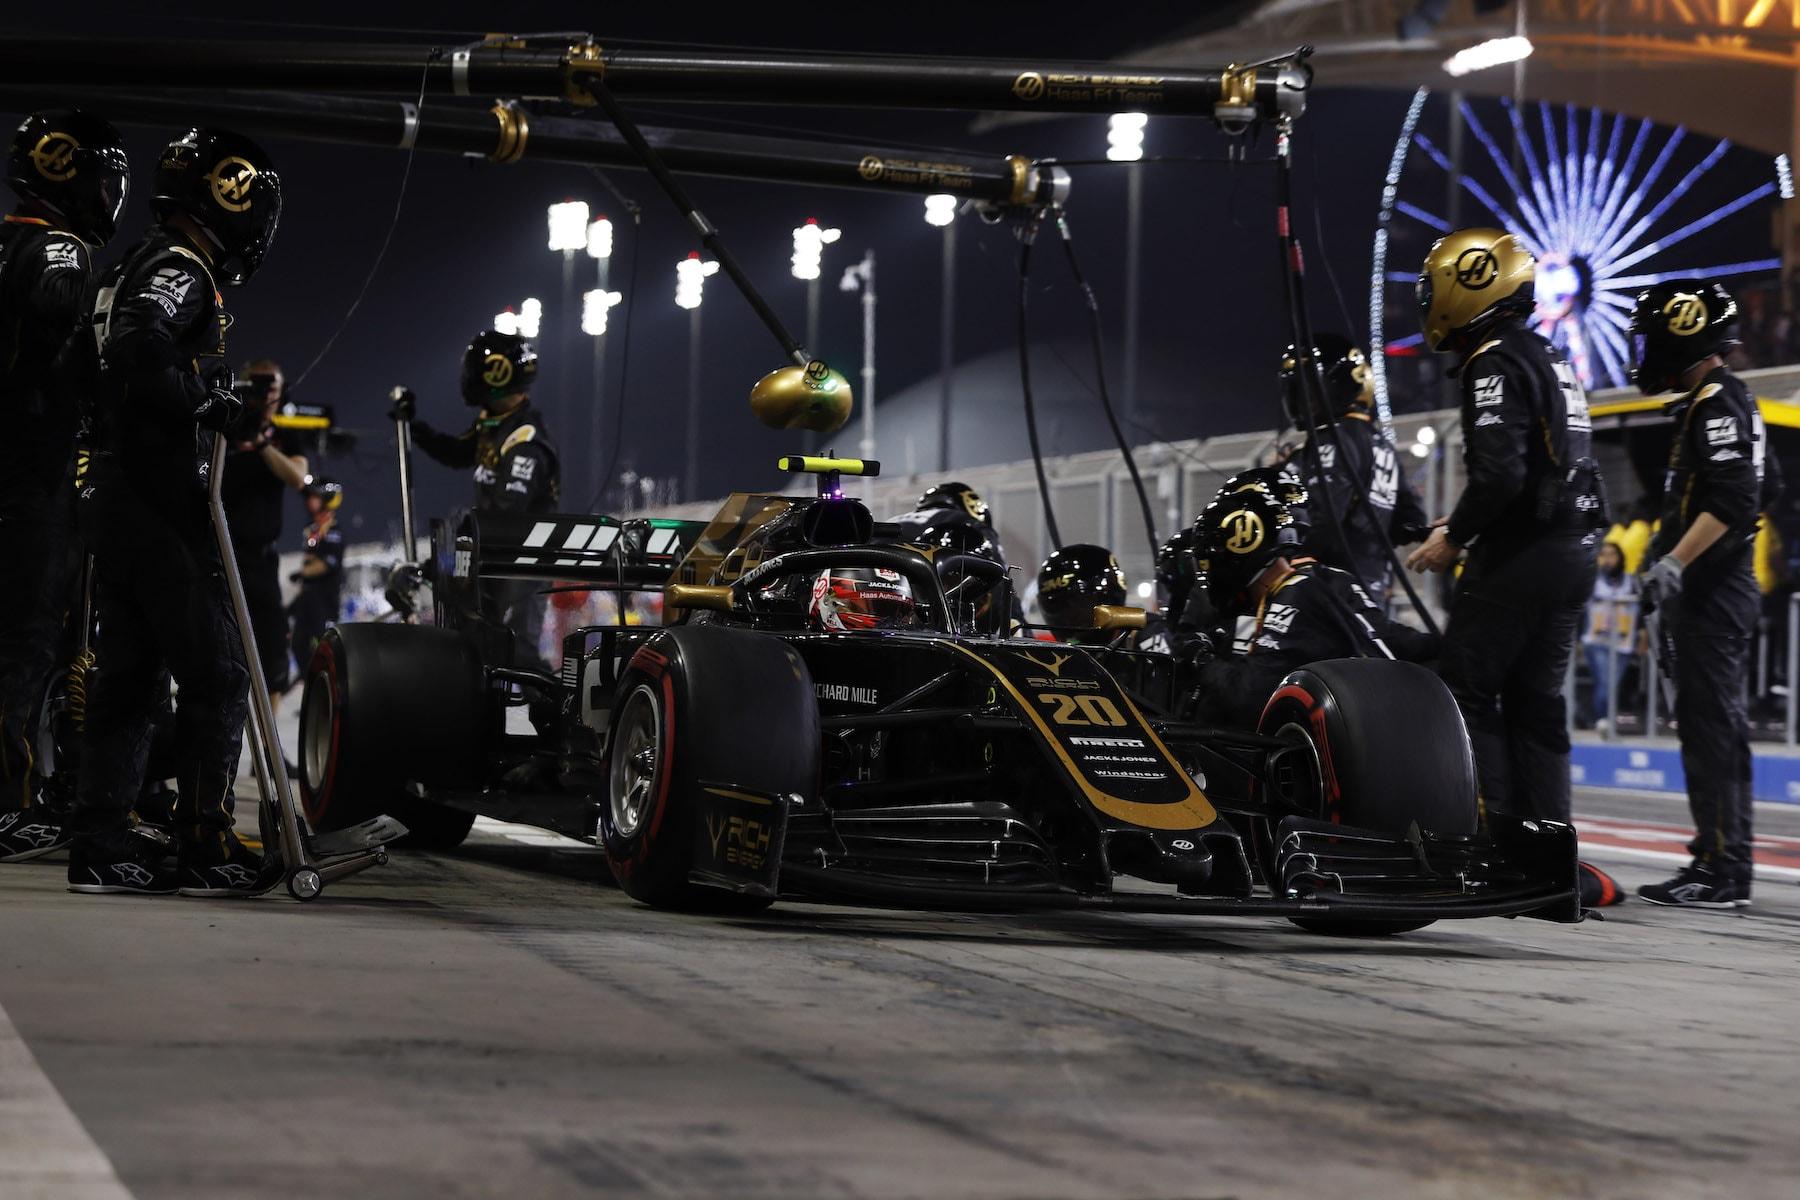 3 5 7 2019 Kevin Magnussen | Haas VF19 | 2019 Bahrain GP 1 copy.jpg